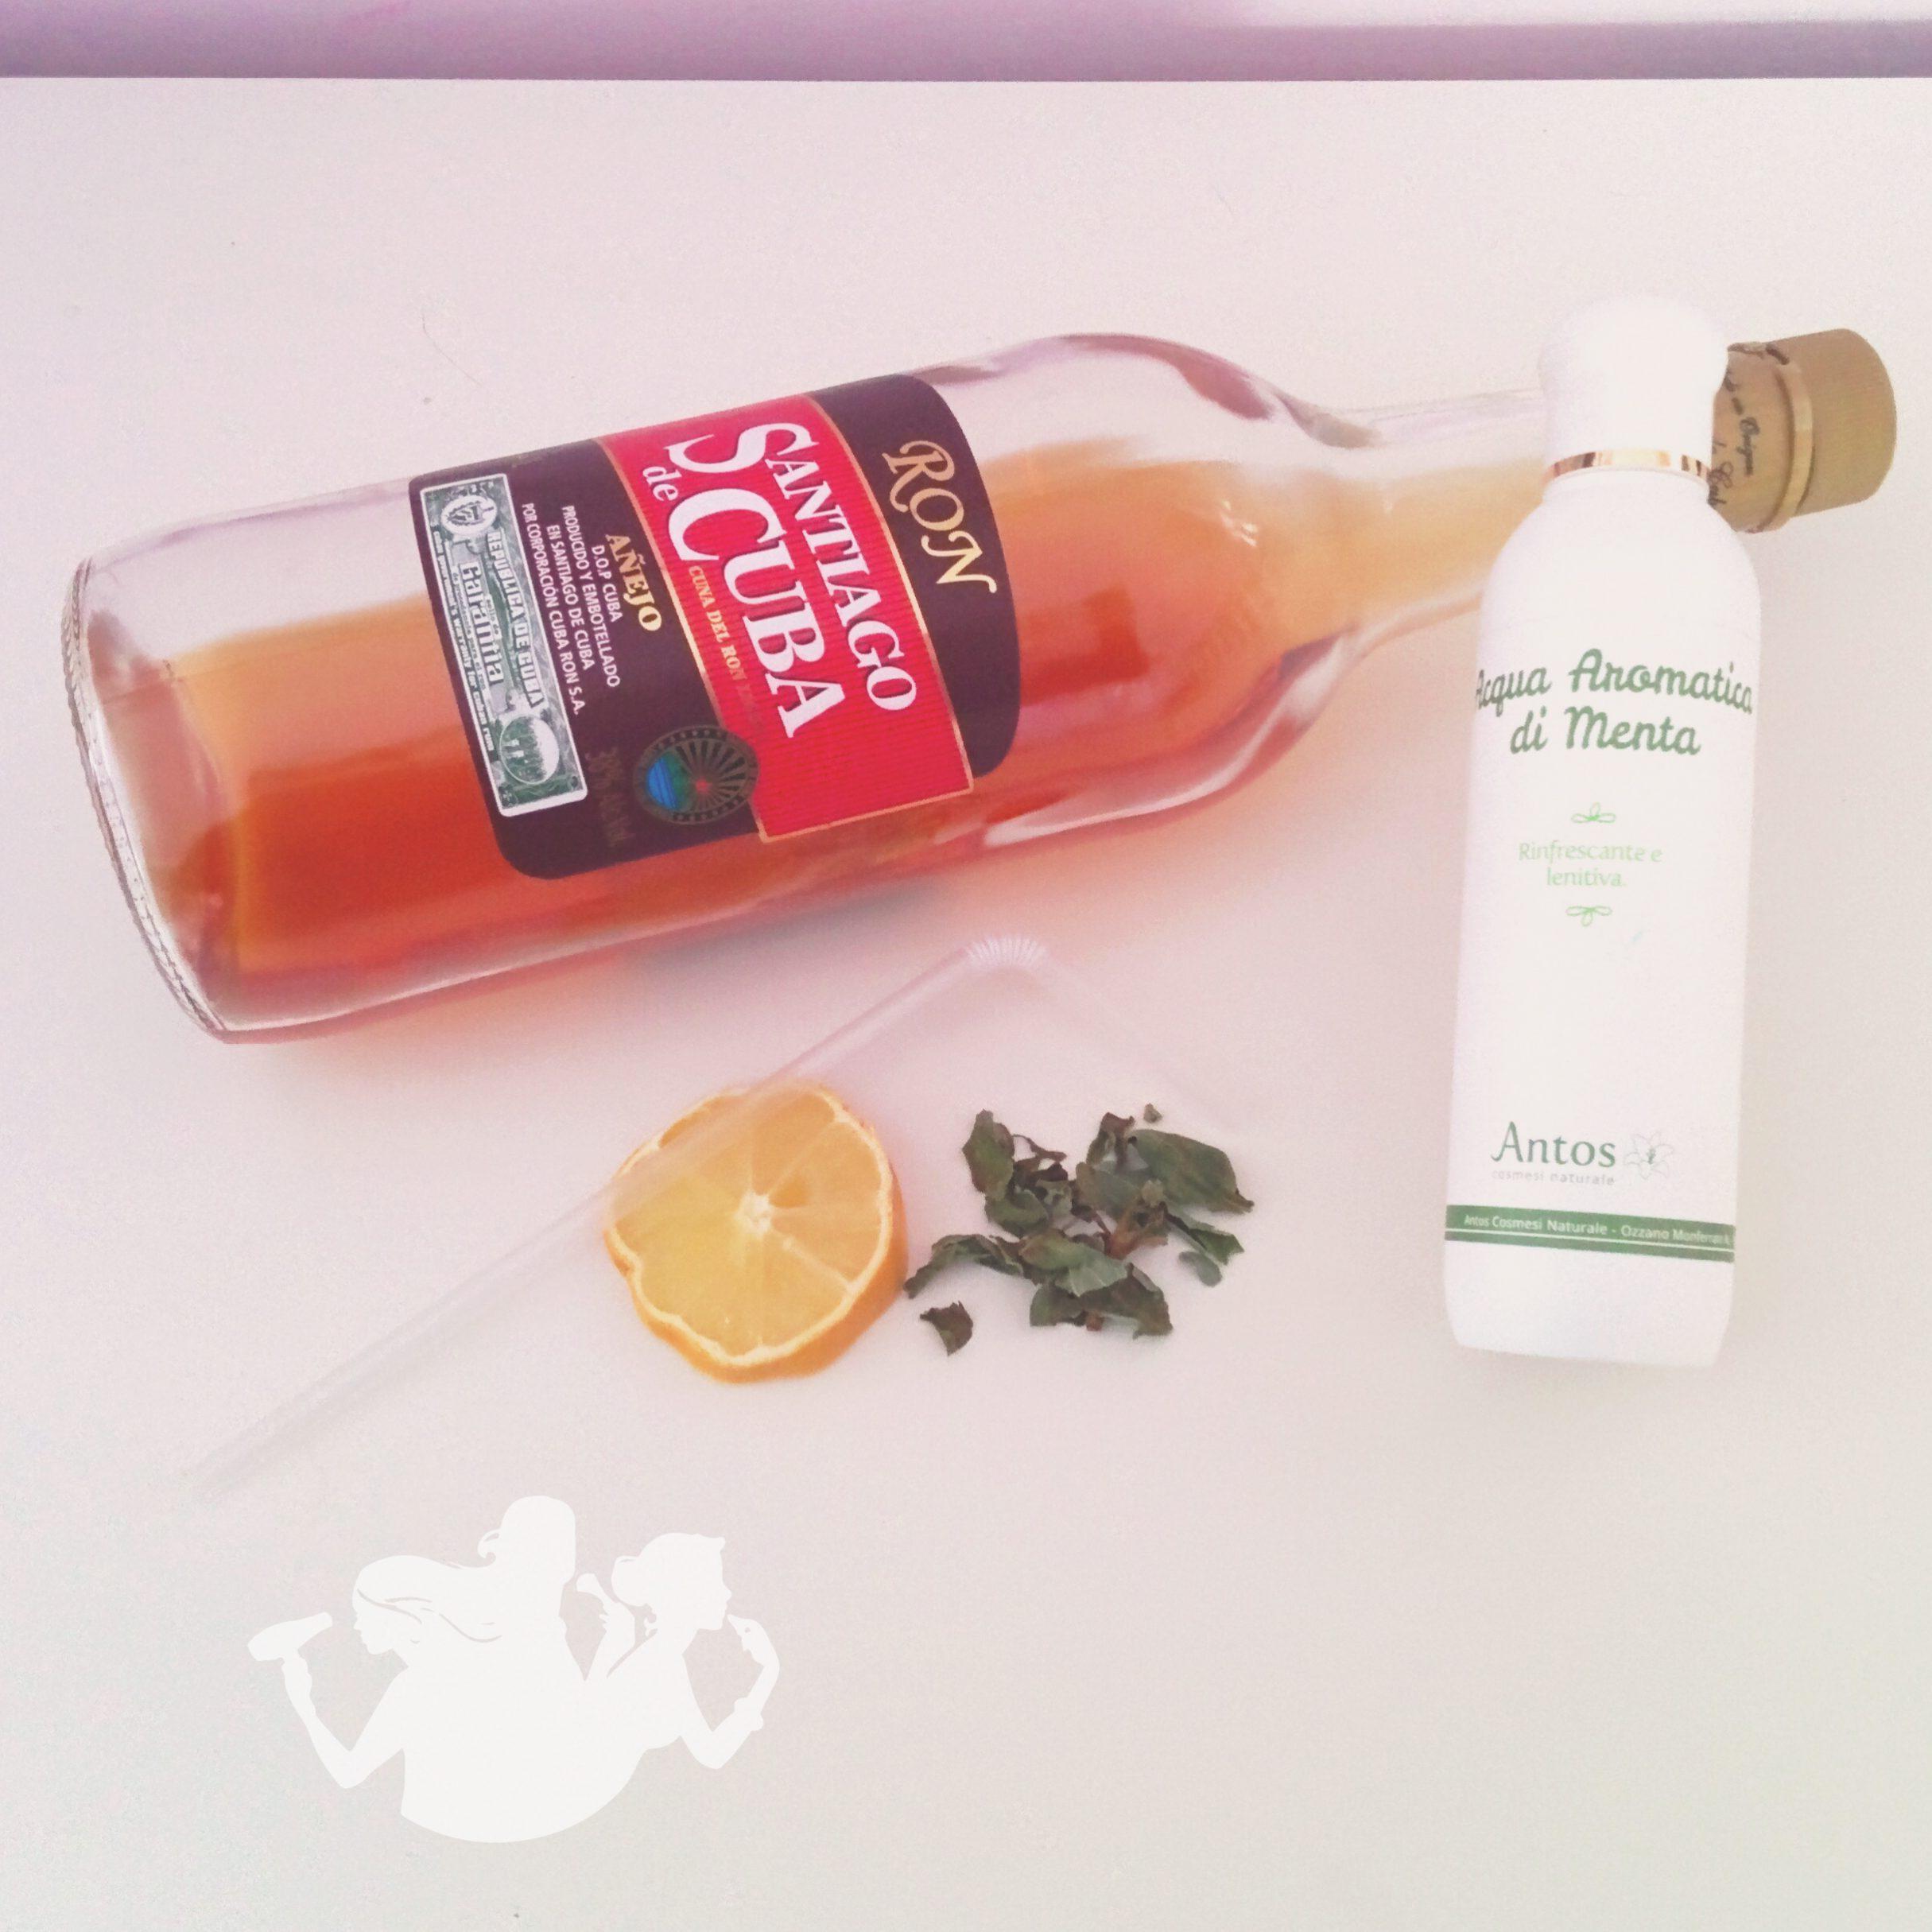 Idrolato di menta [acqua aromatica] – Antos